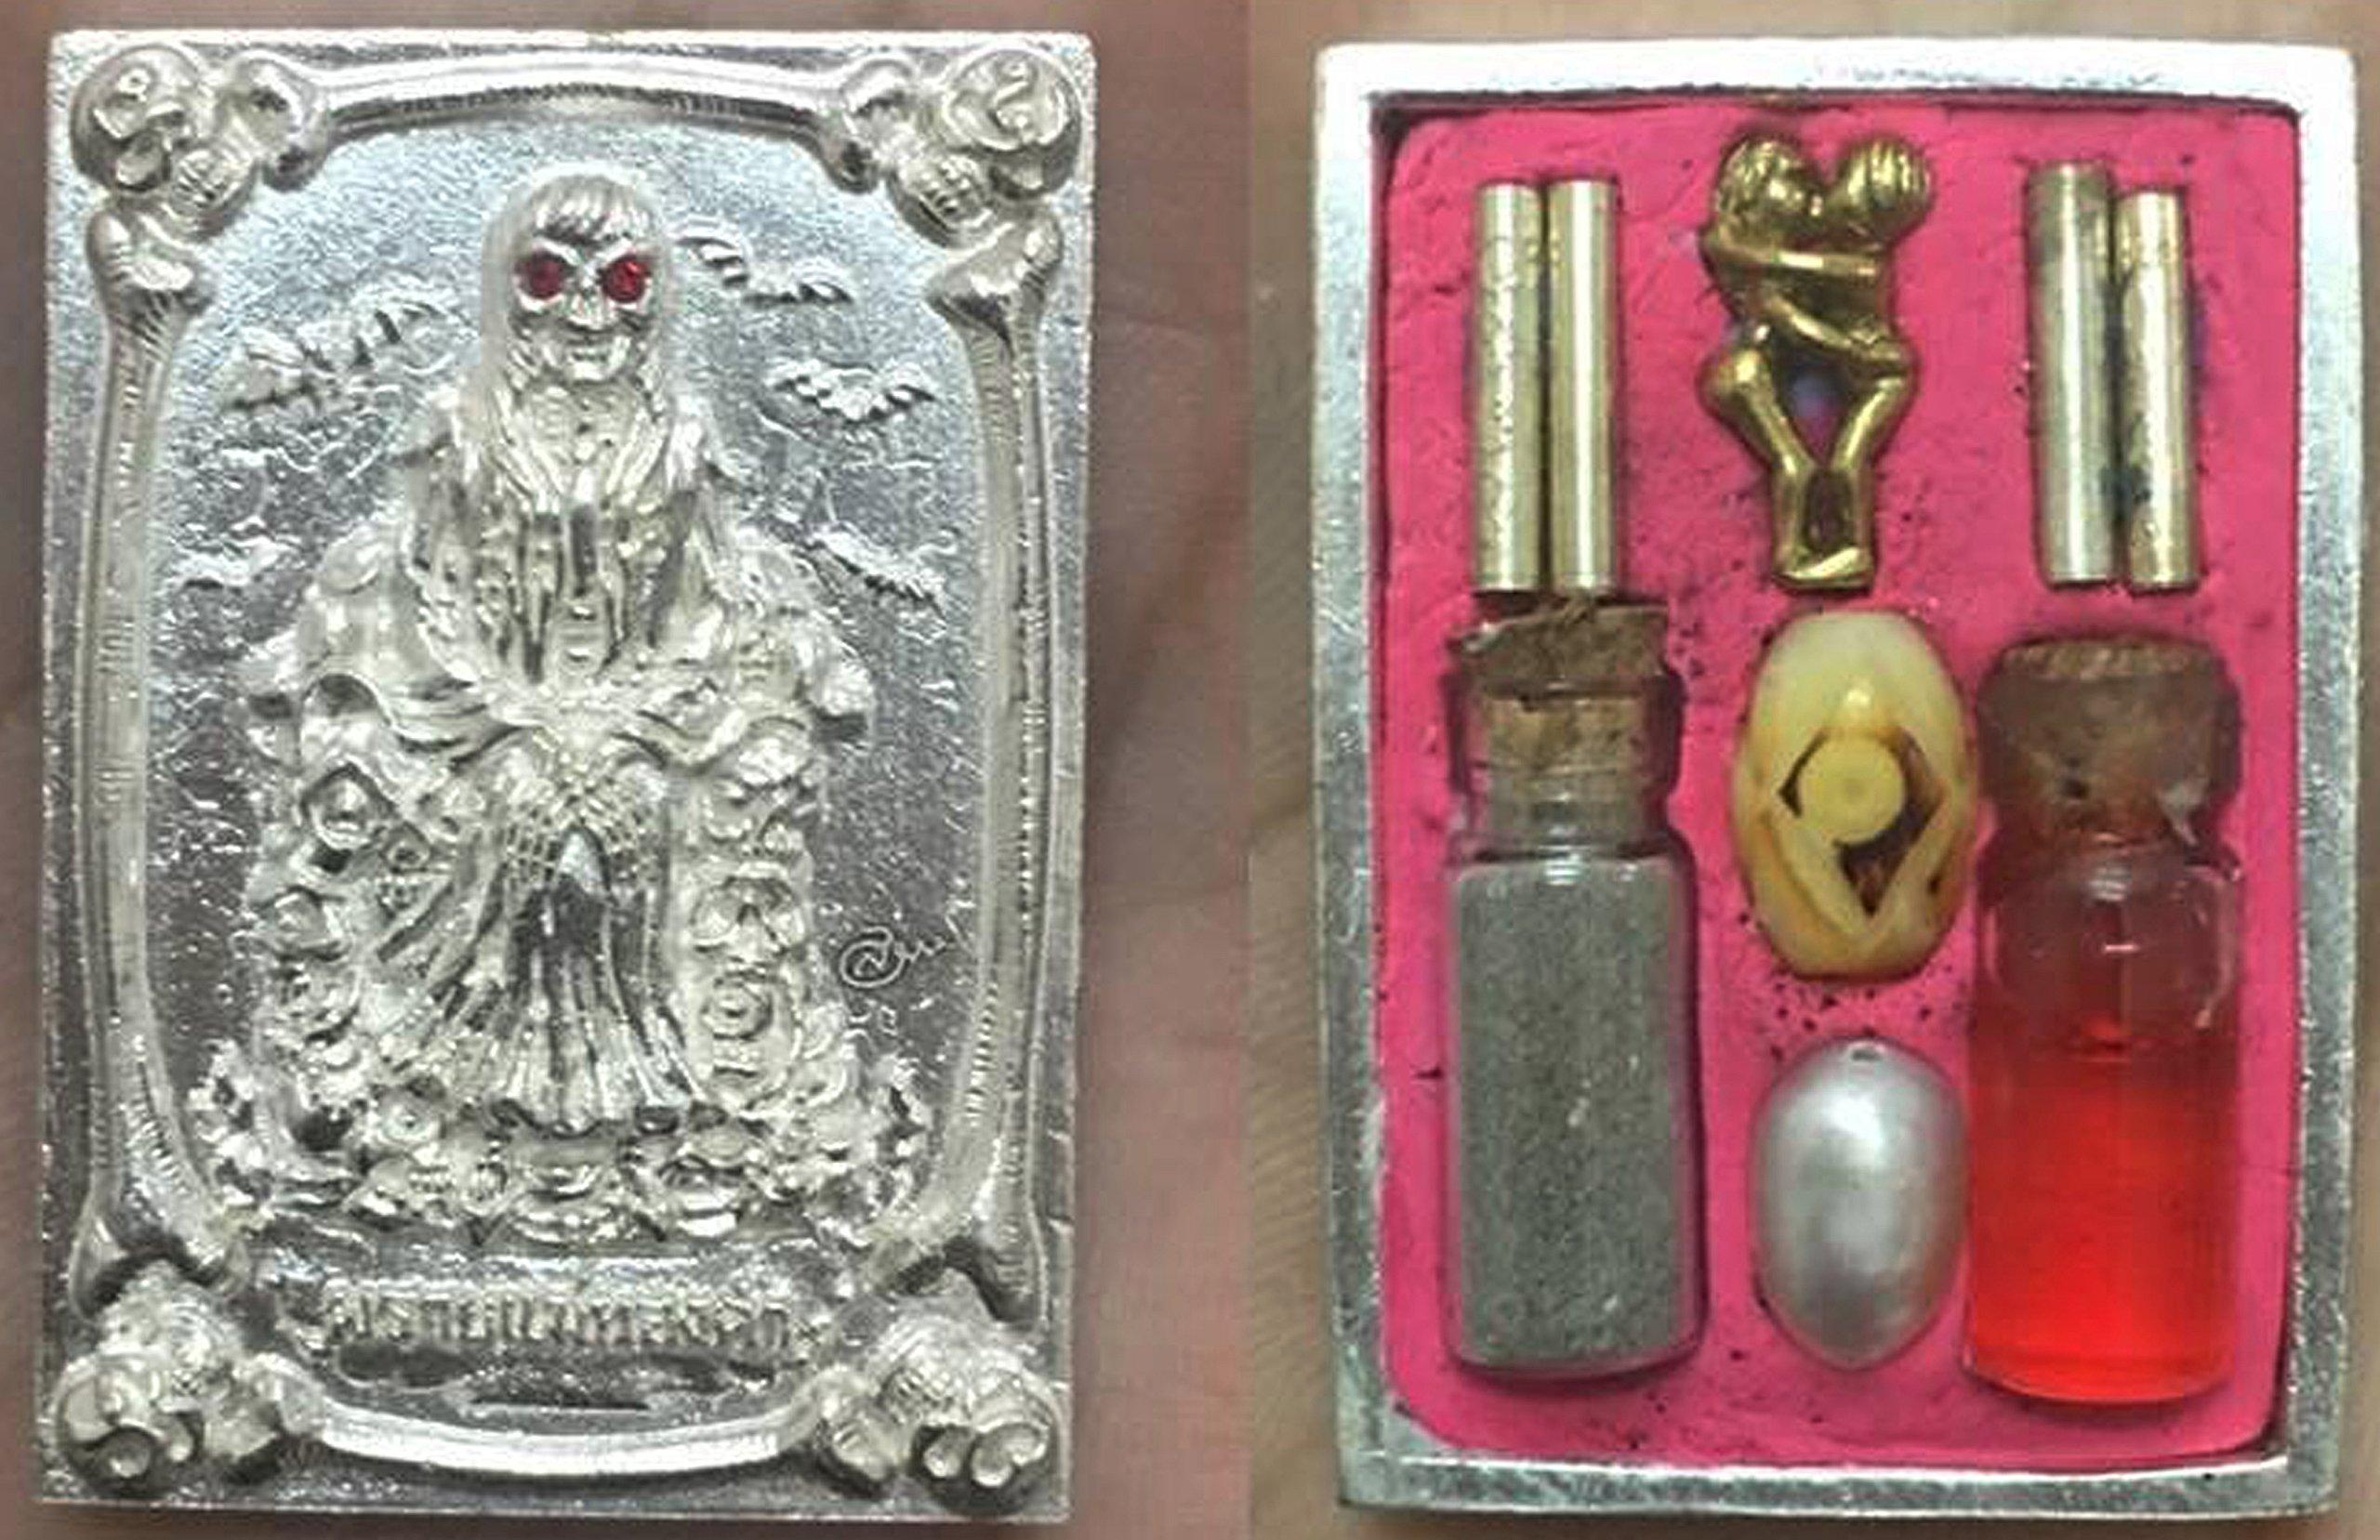 Good Luck Business Jewelry Magic Pendant Phrai Mae Tongkaam Naa Nah Tong Riagtraab Raabchock Amulet by Kruuba Subin by Amulet Land (Image #3)